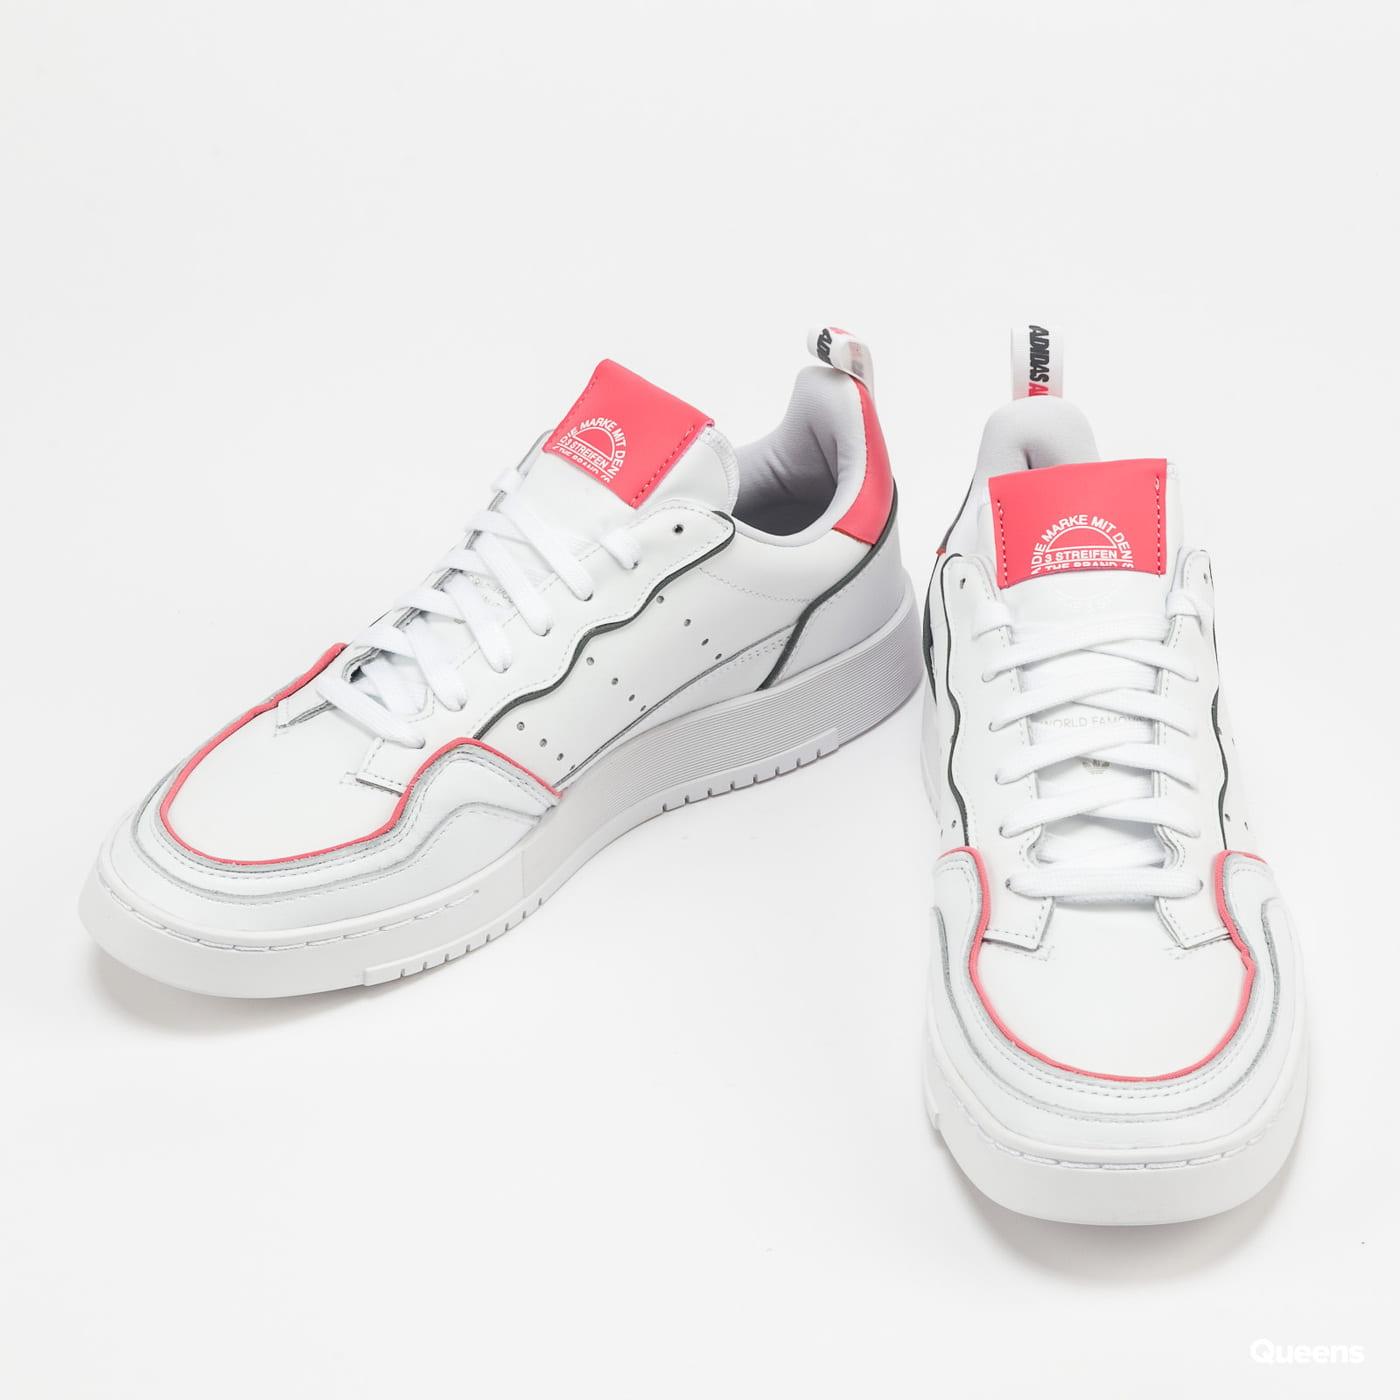 adidas Originals Supercourt ftwwht / ftwwht / hazros